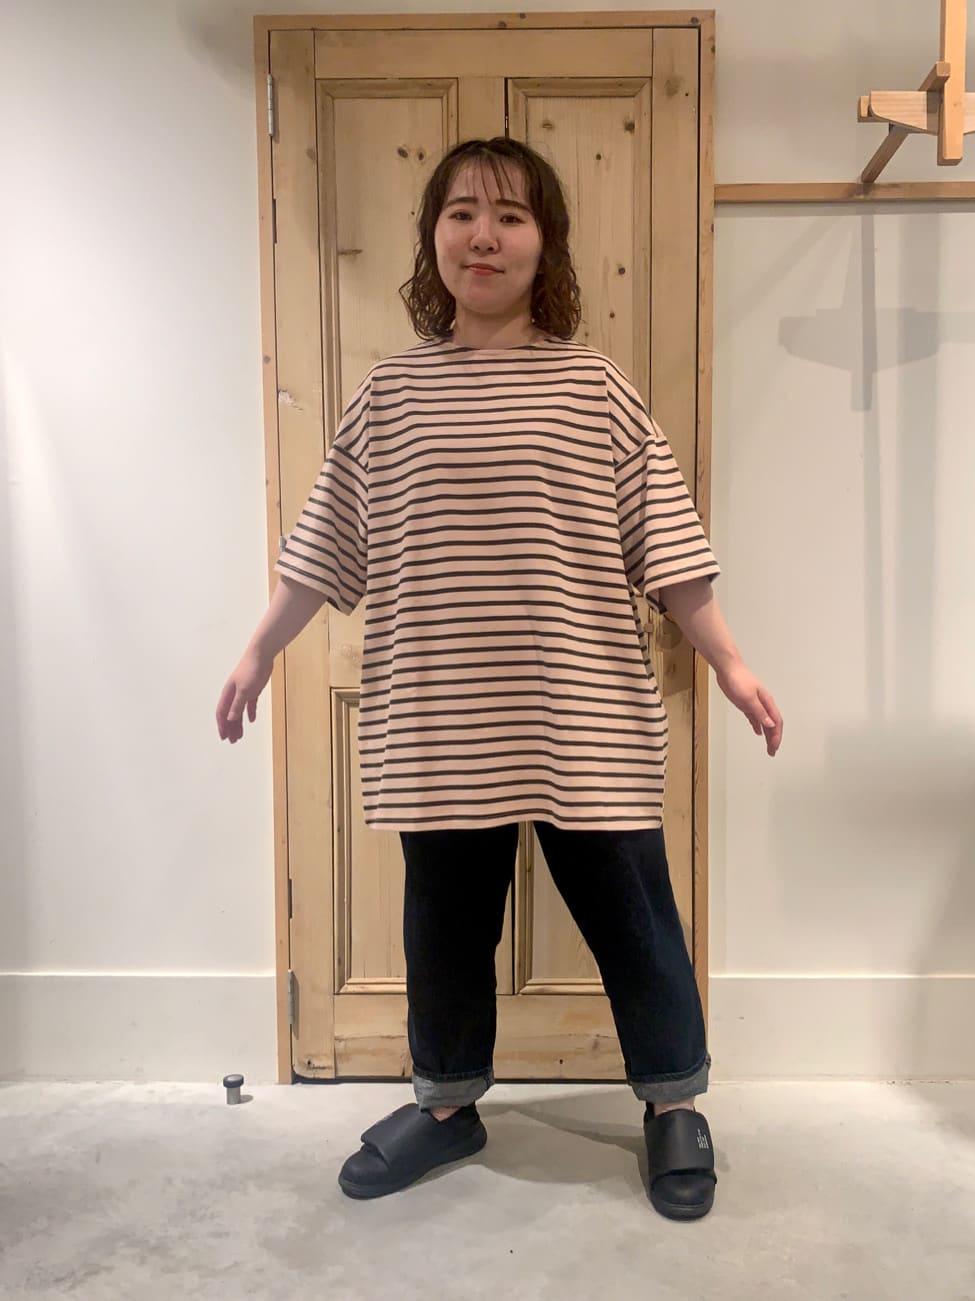 Malle chambre de charme 調布パルコ 身長:155cm 2021.07.13